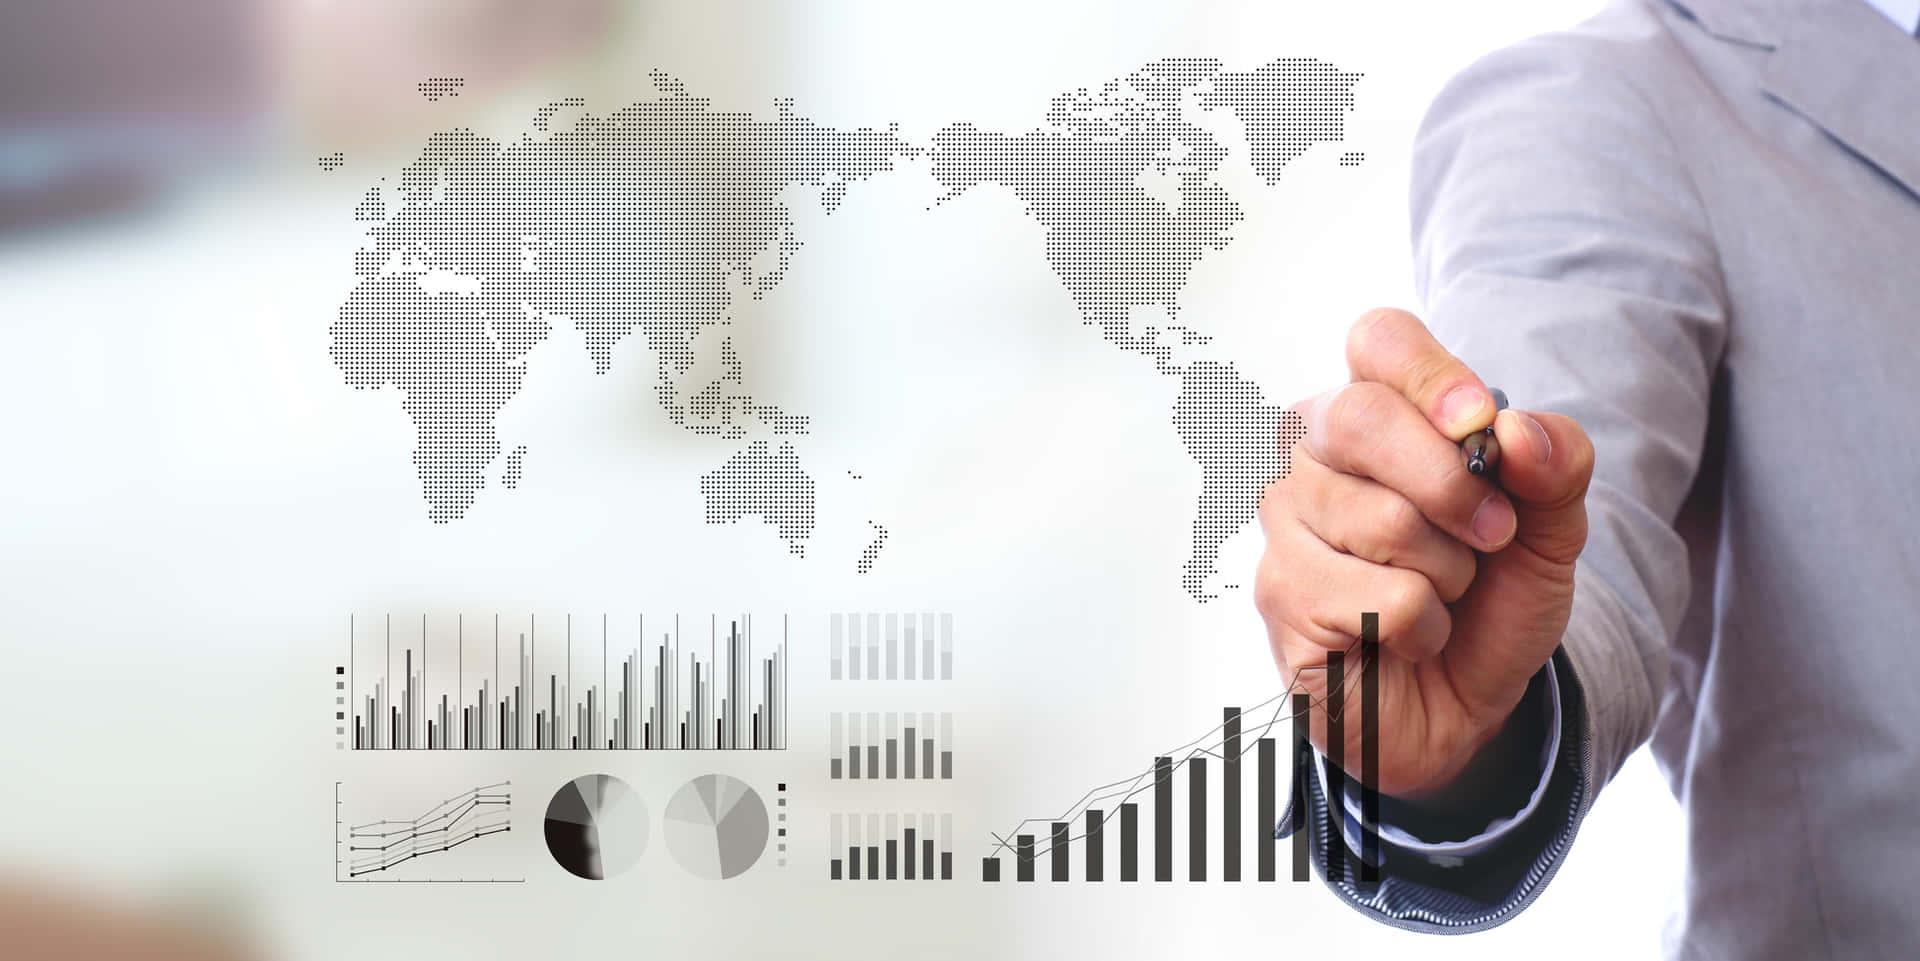 x個人投資家の勝率とはパフォーマンスを上げるための勉強の必要性とおすすめ無料セミナーを紹介する。